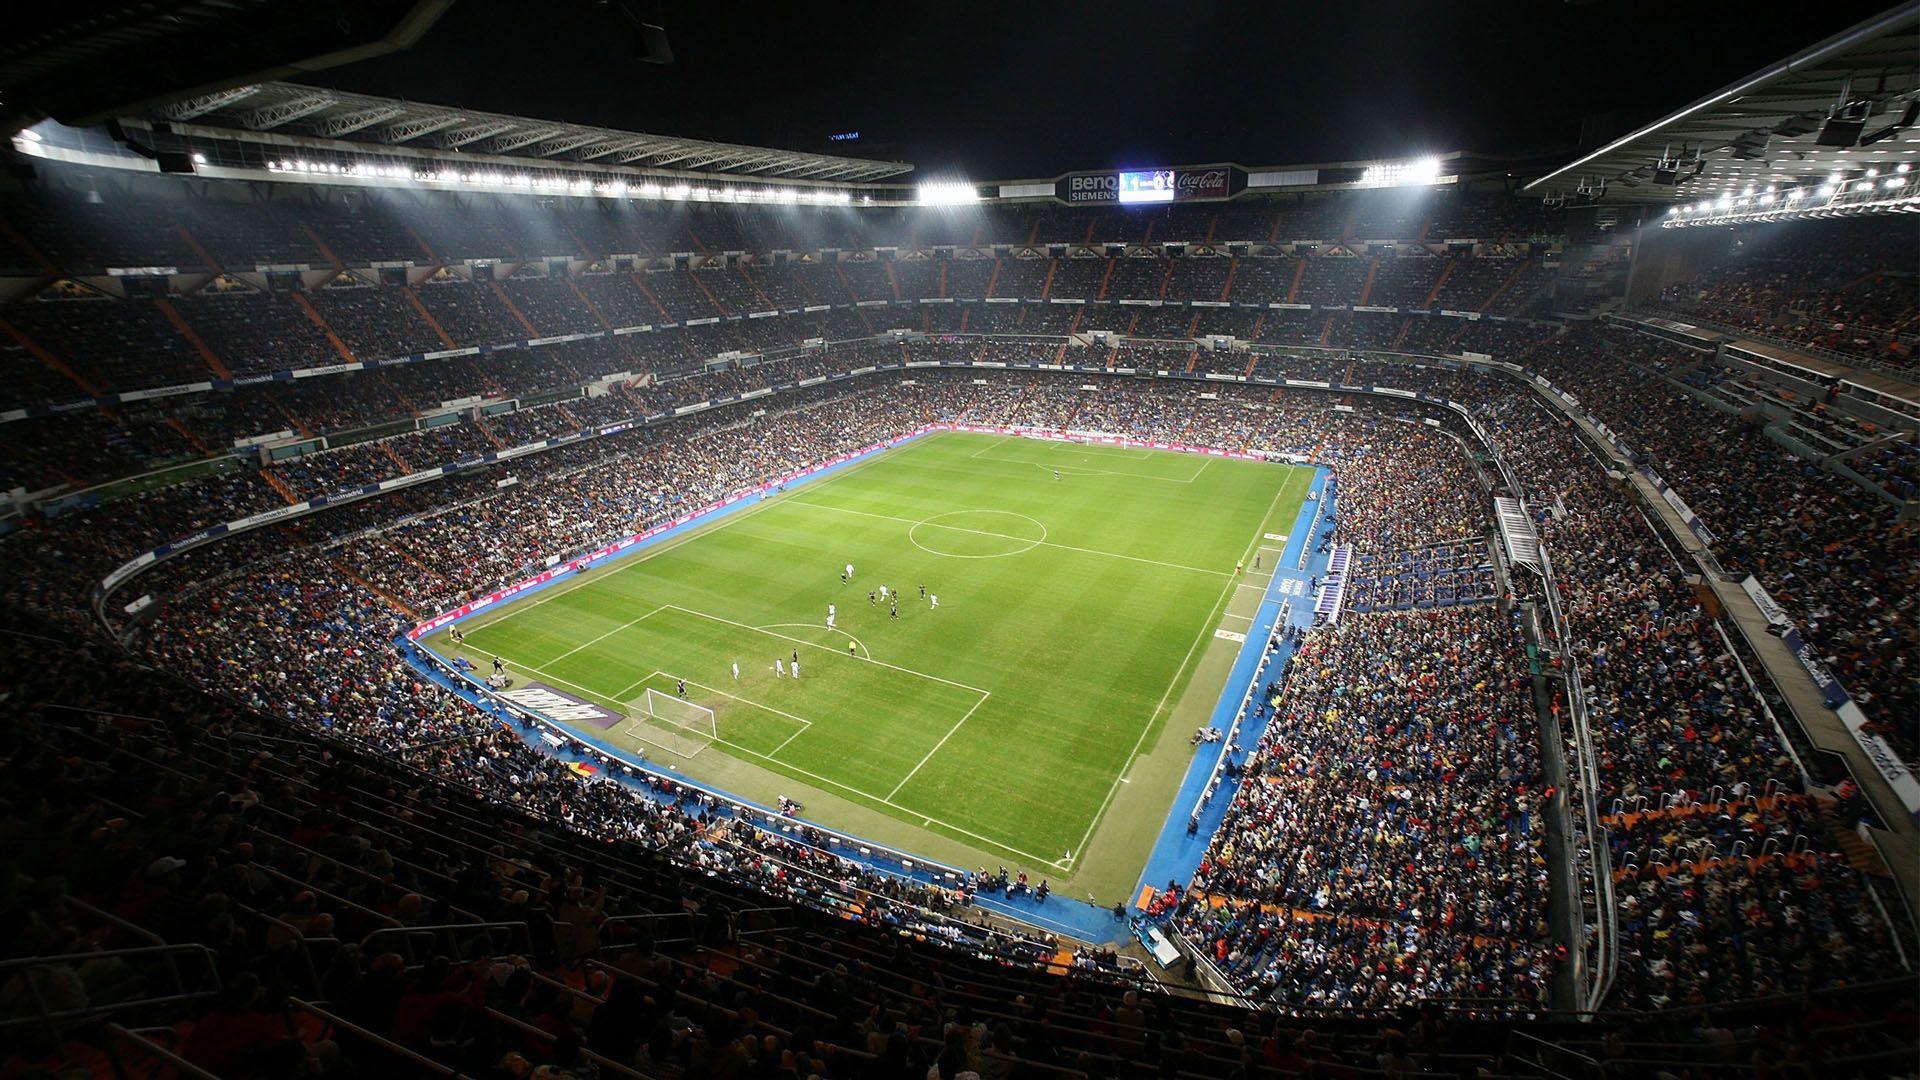 Santiago bernabeu real madrid stadium wallpaper stuff to for Puerta 6 santiago bernabeu